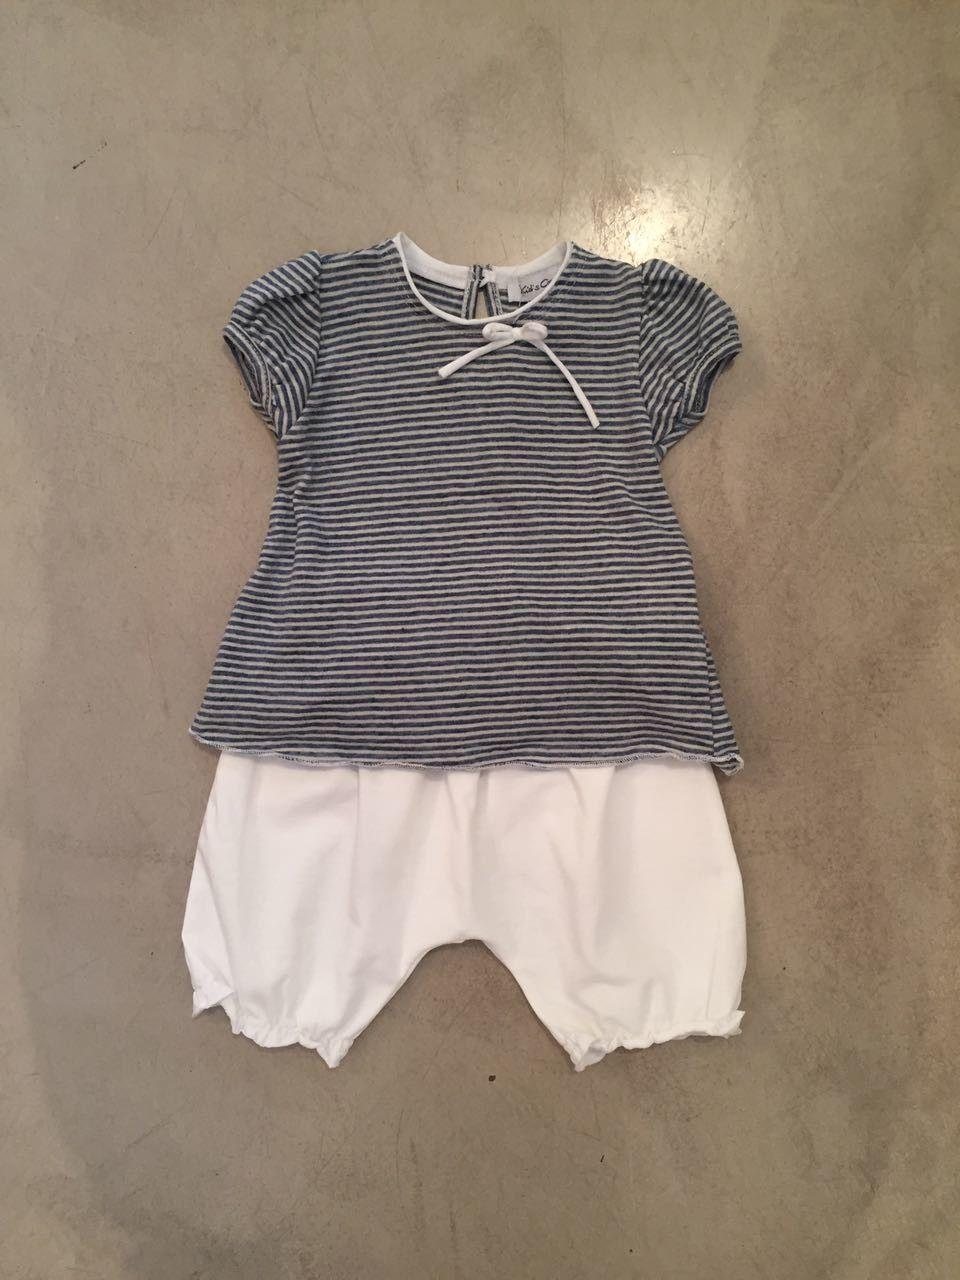 Completino pantalone e t-shirt righe KID'S COMPANY 71K1545